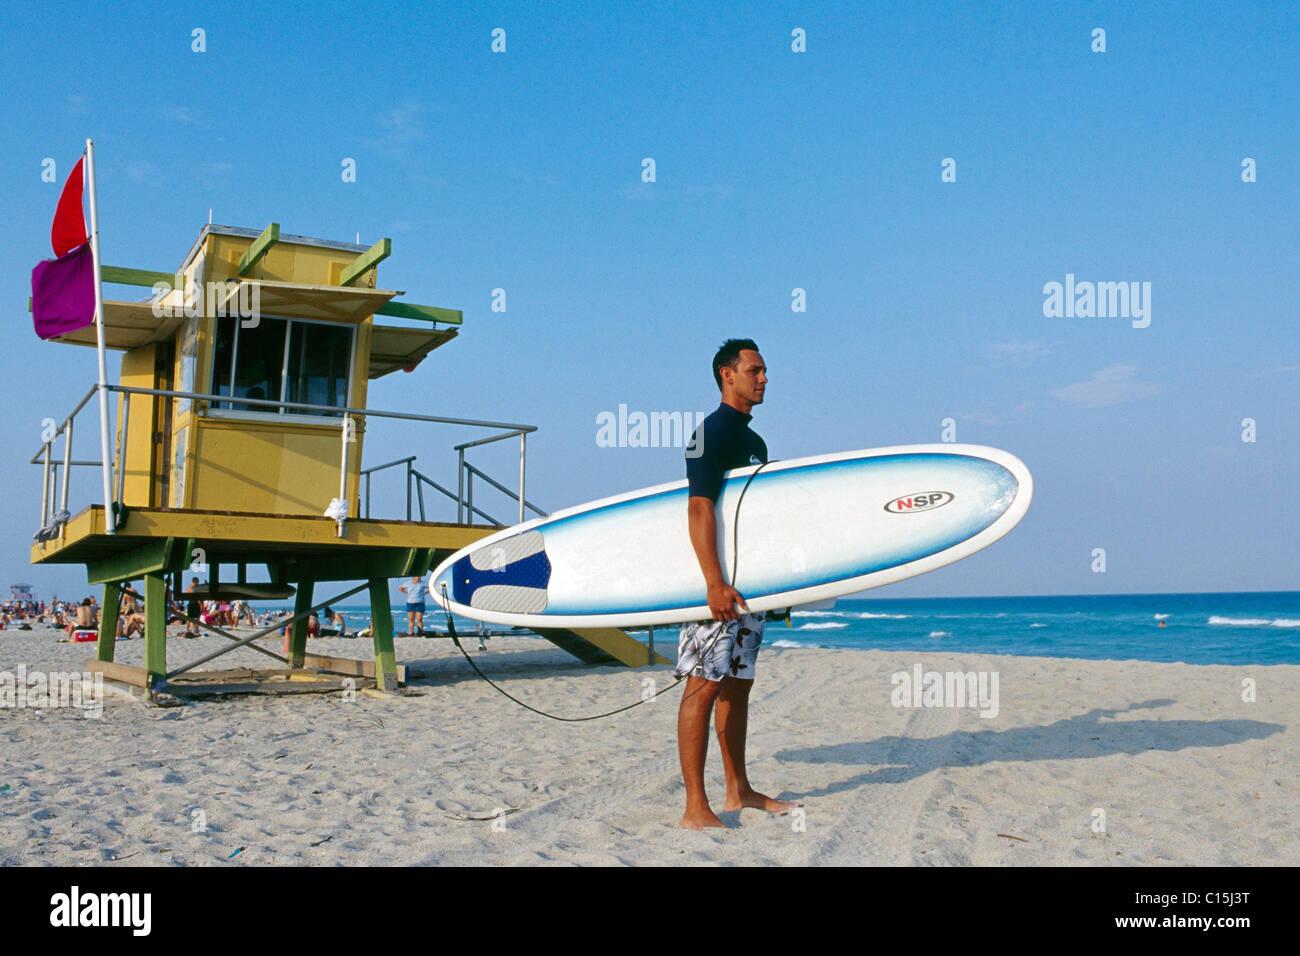 Surfer with his board under his arm, South Beach, Miami Beach, Miami, Florida, USA - Stock Image